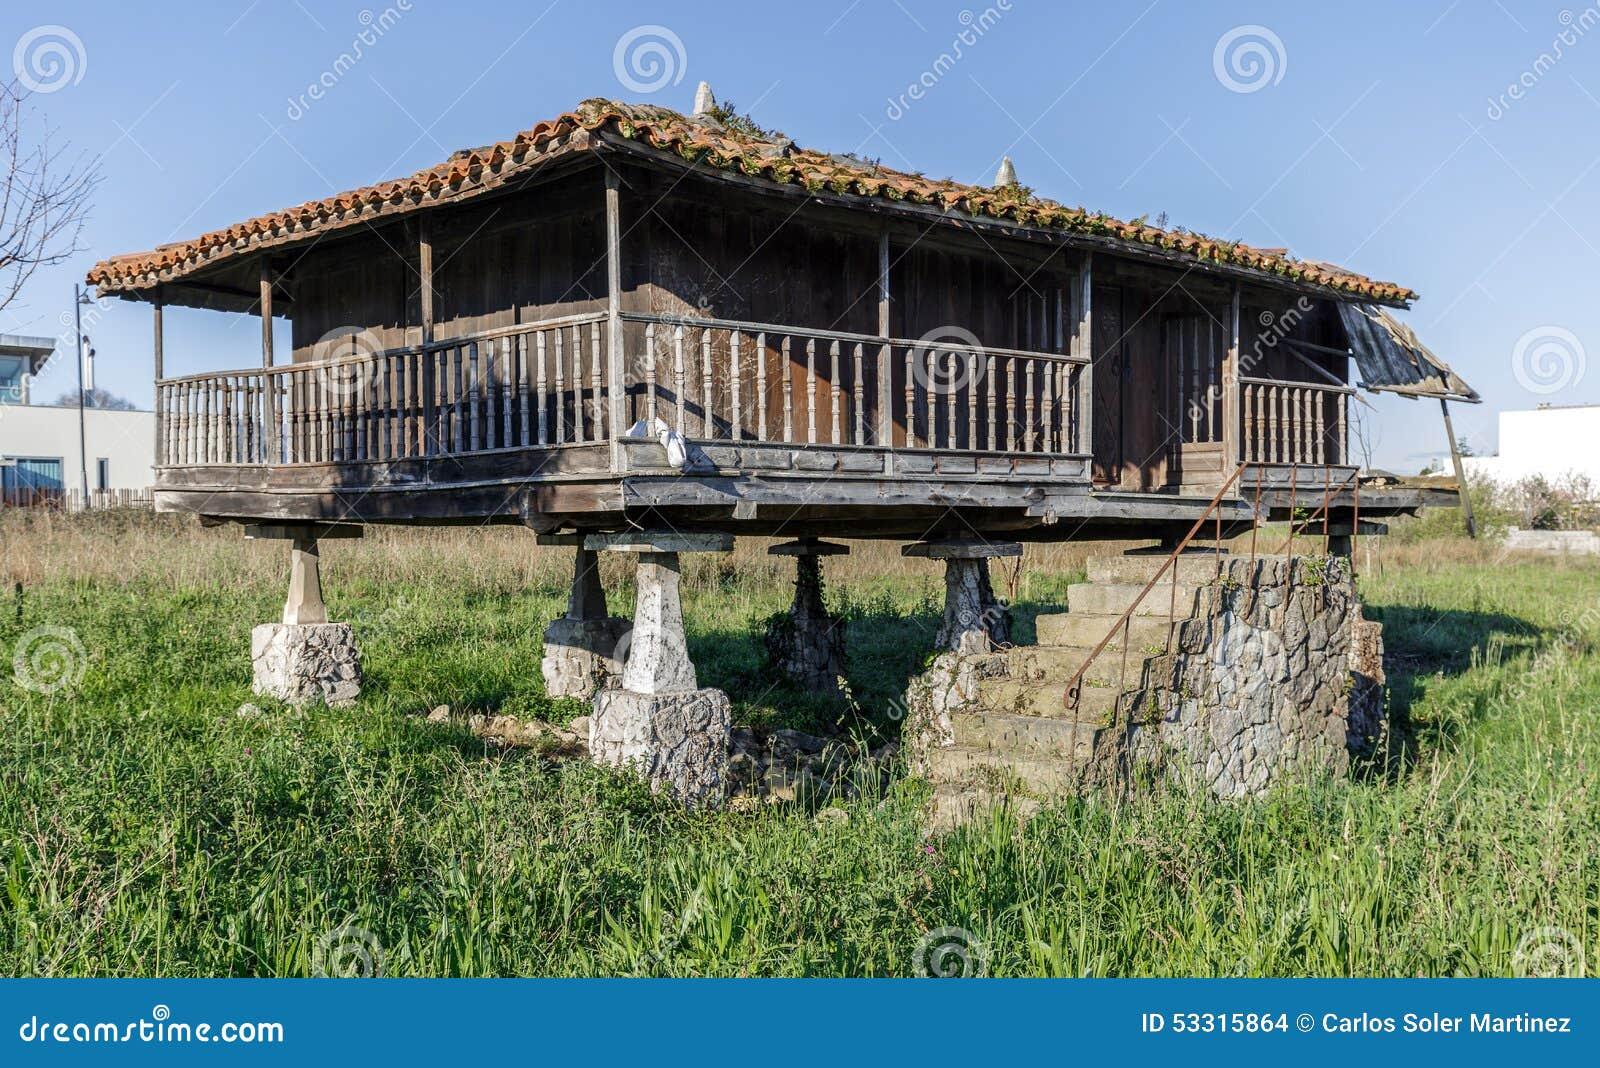 Horreo granero casa gallega t pica foto de archivo imagen de colorido edificio 53315864 - Casa tipica gallega ...